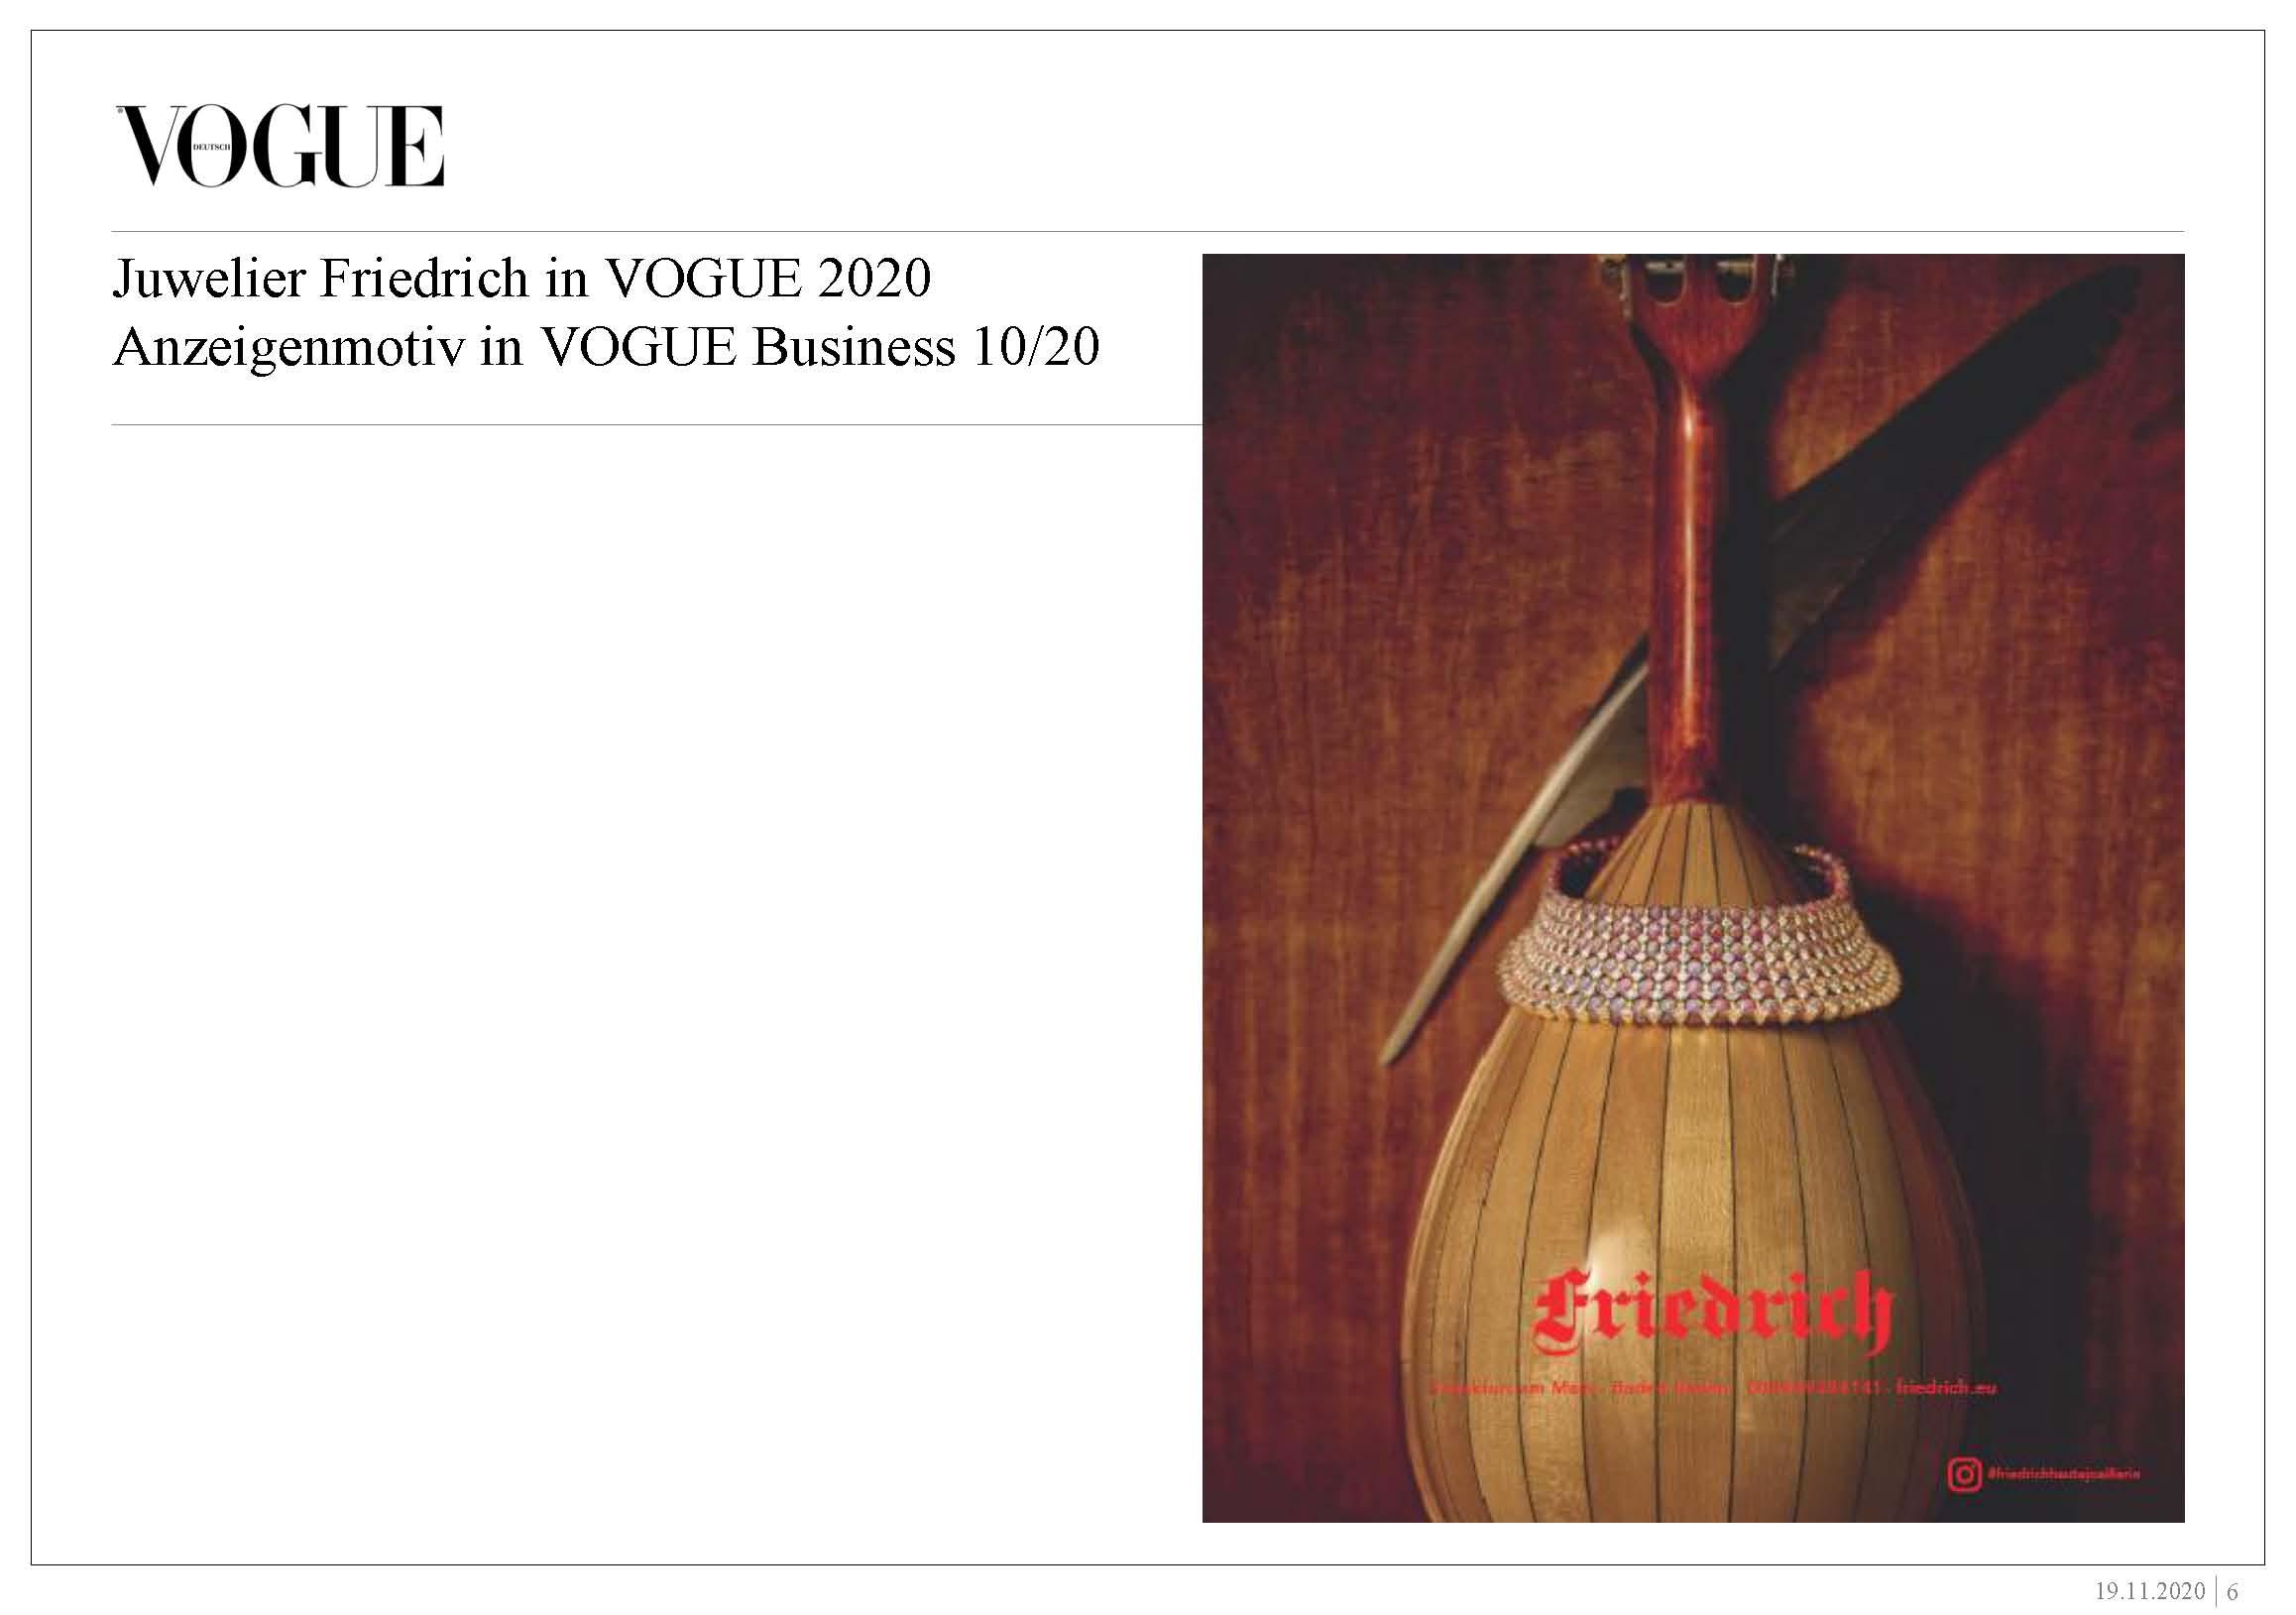 Vogue 10-20